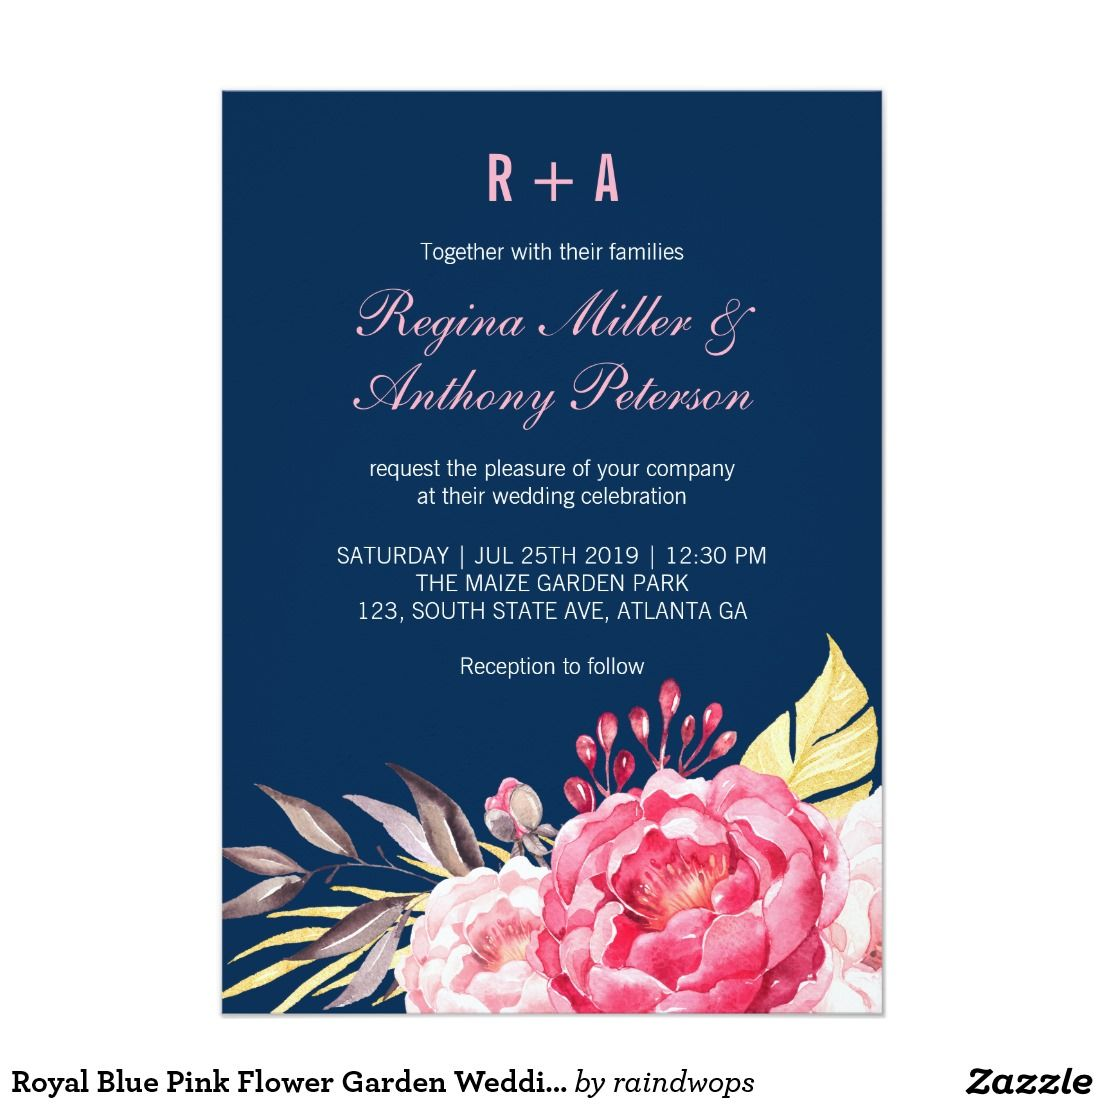 Royal Blue Pink Flower Garden Wedding Invitation